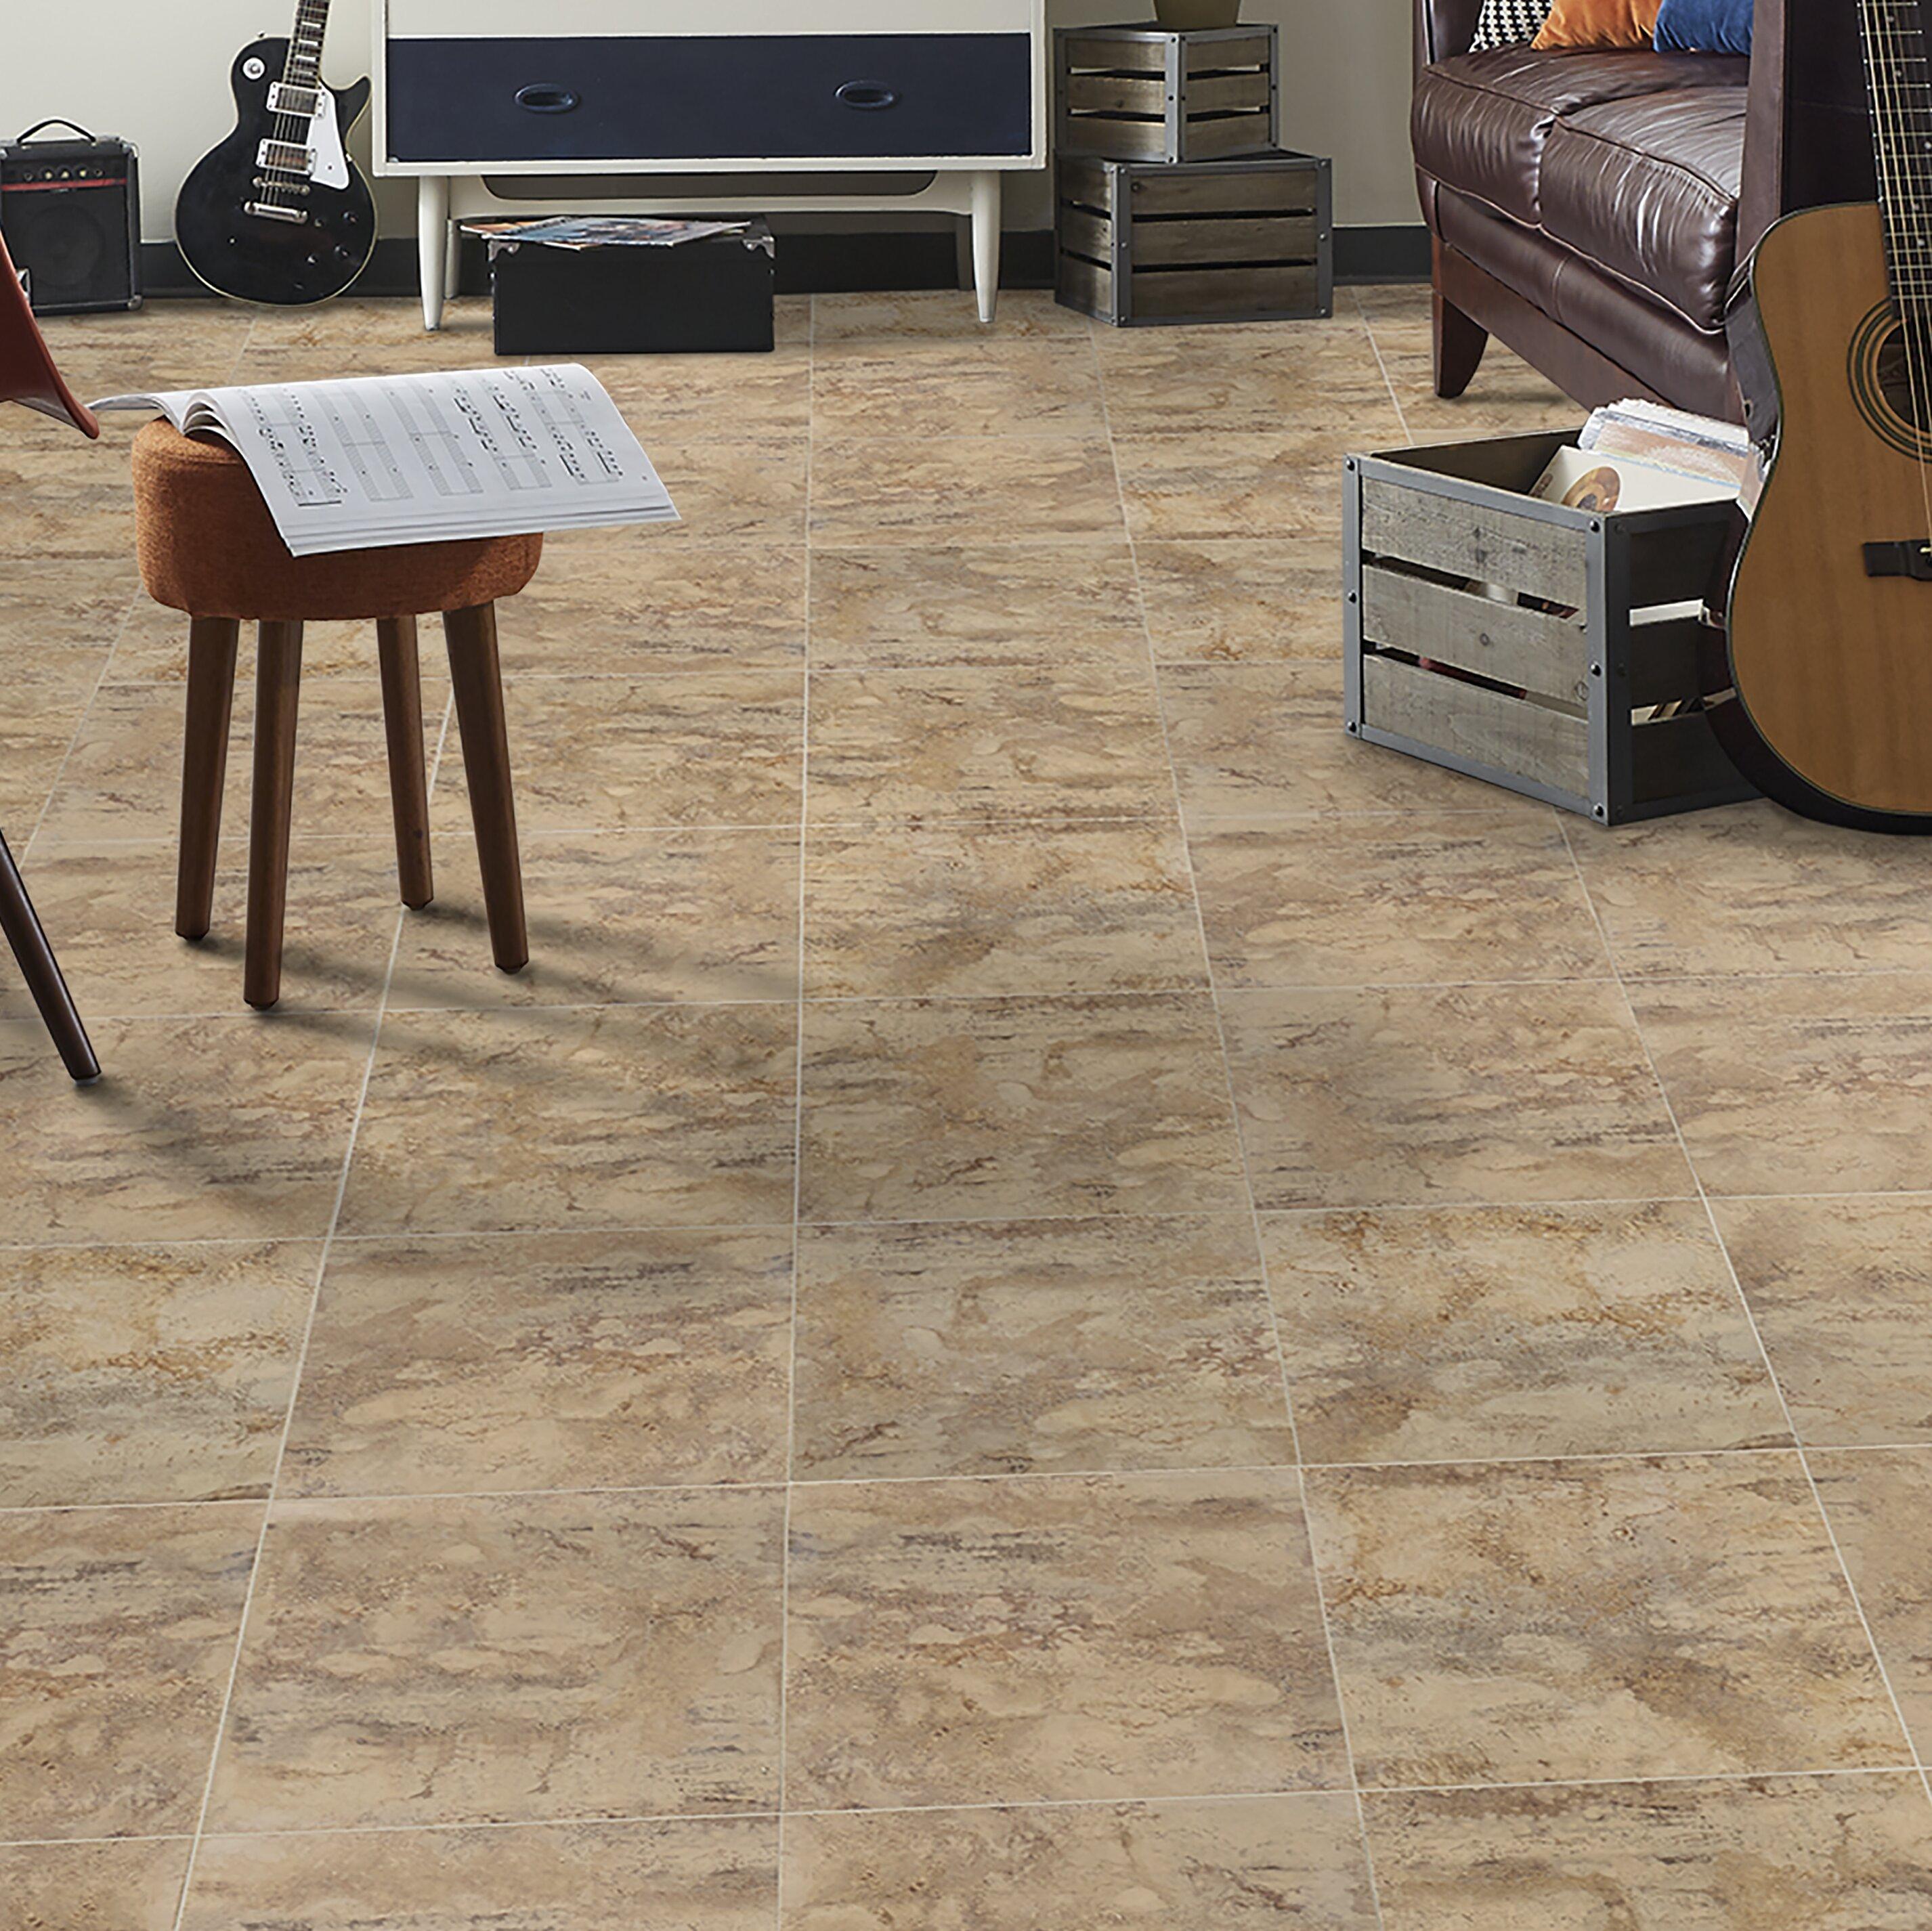 Mannington adura flex manhattan 18 x 18 x 2 5mm luxury vinyl tile wayfair